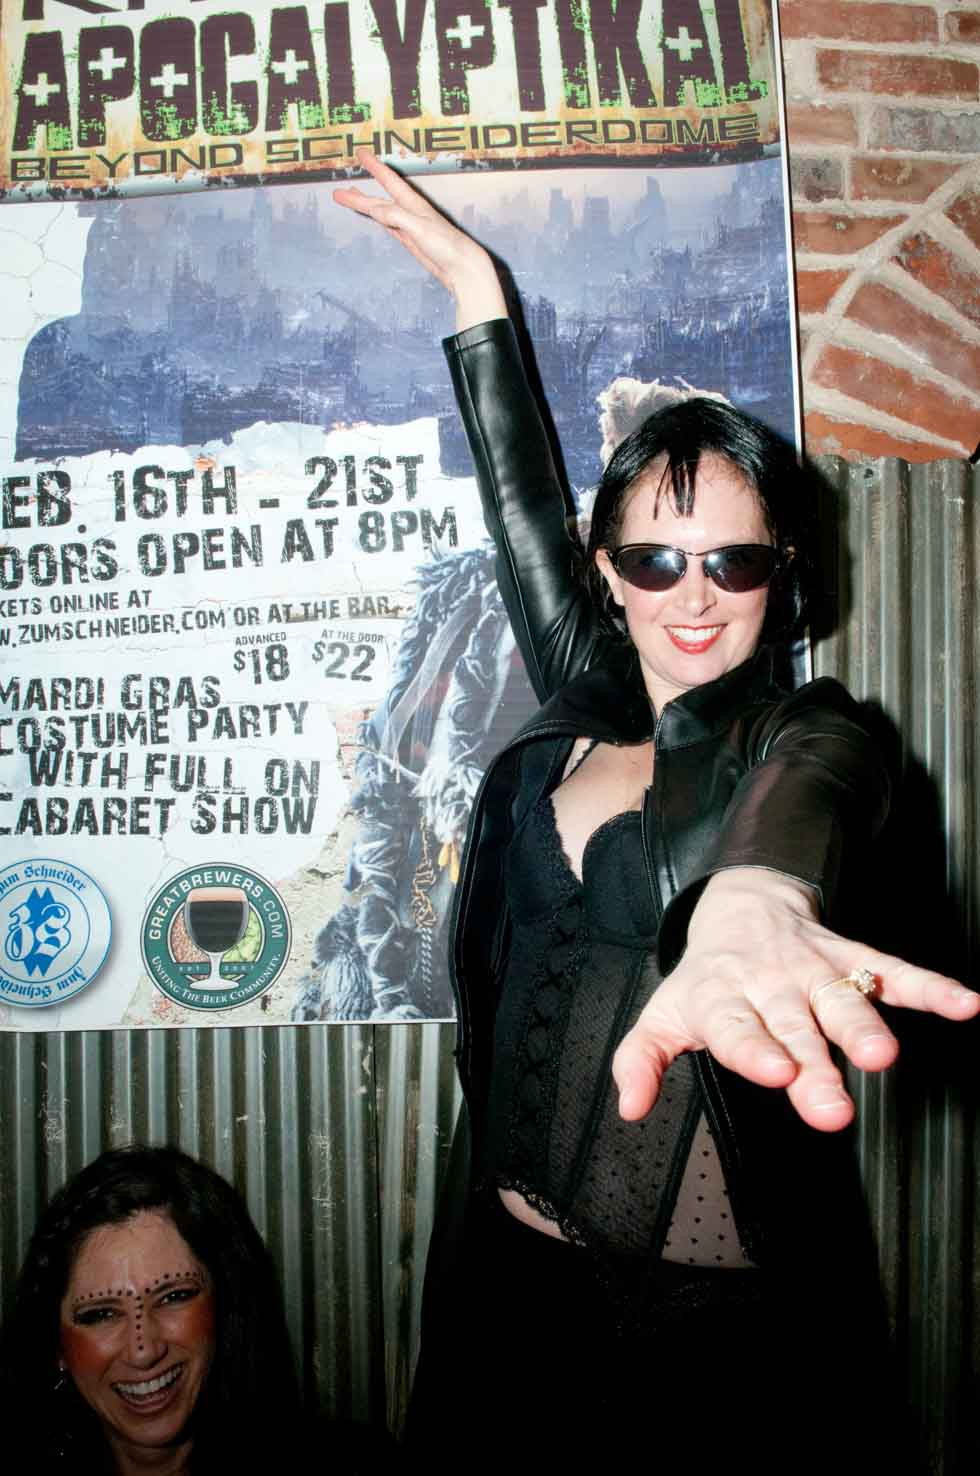 zum-schneider-nyc-2012-karneval-apocalyptika-3233.jpg